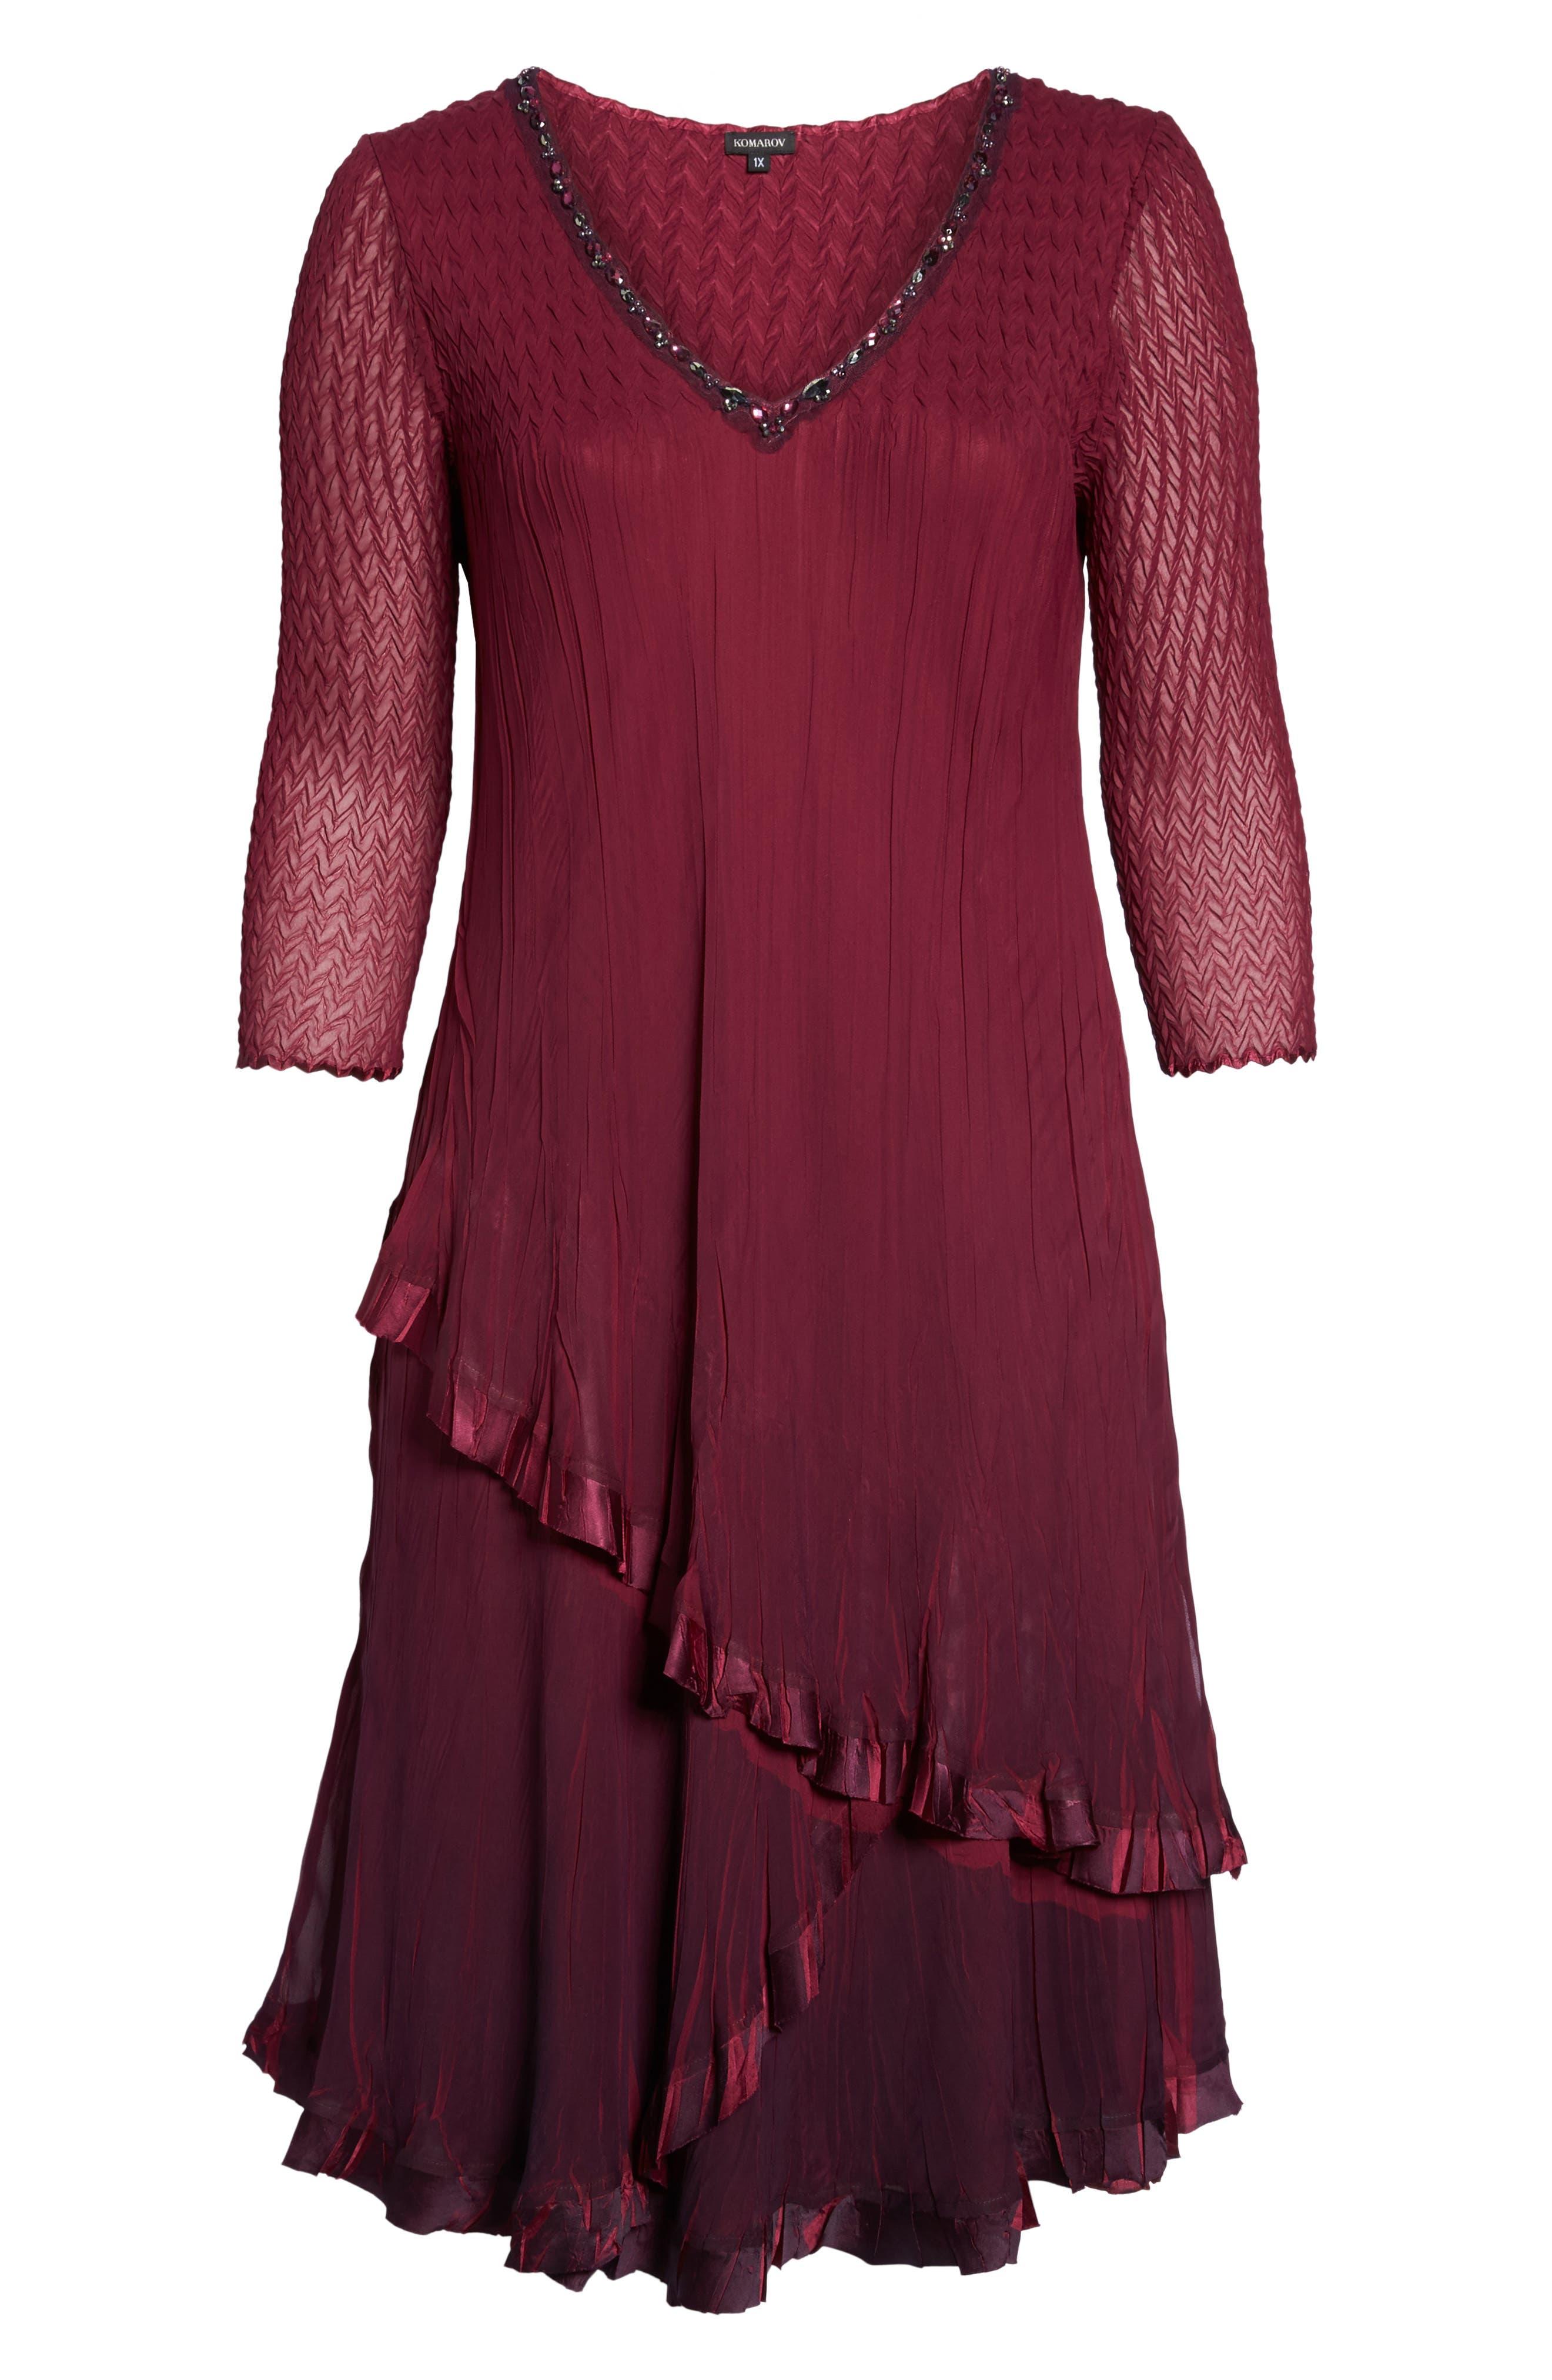 Tiered Ombrè Charmeuse & Chiffon Dress,                             Alternate thumbnail 6, color,                             644